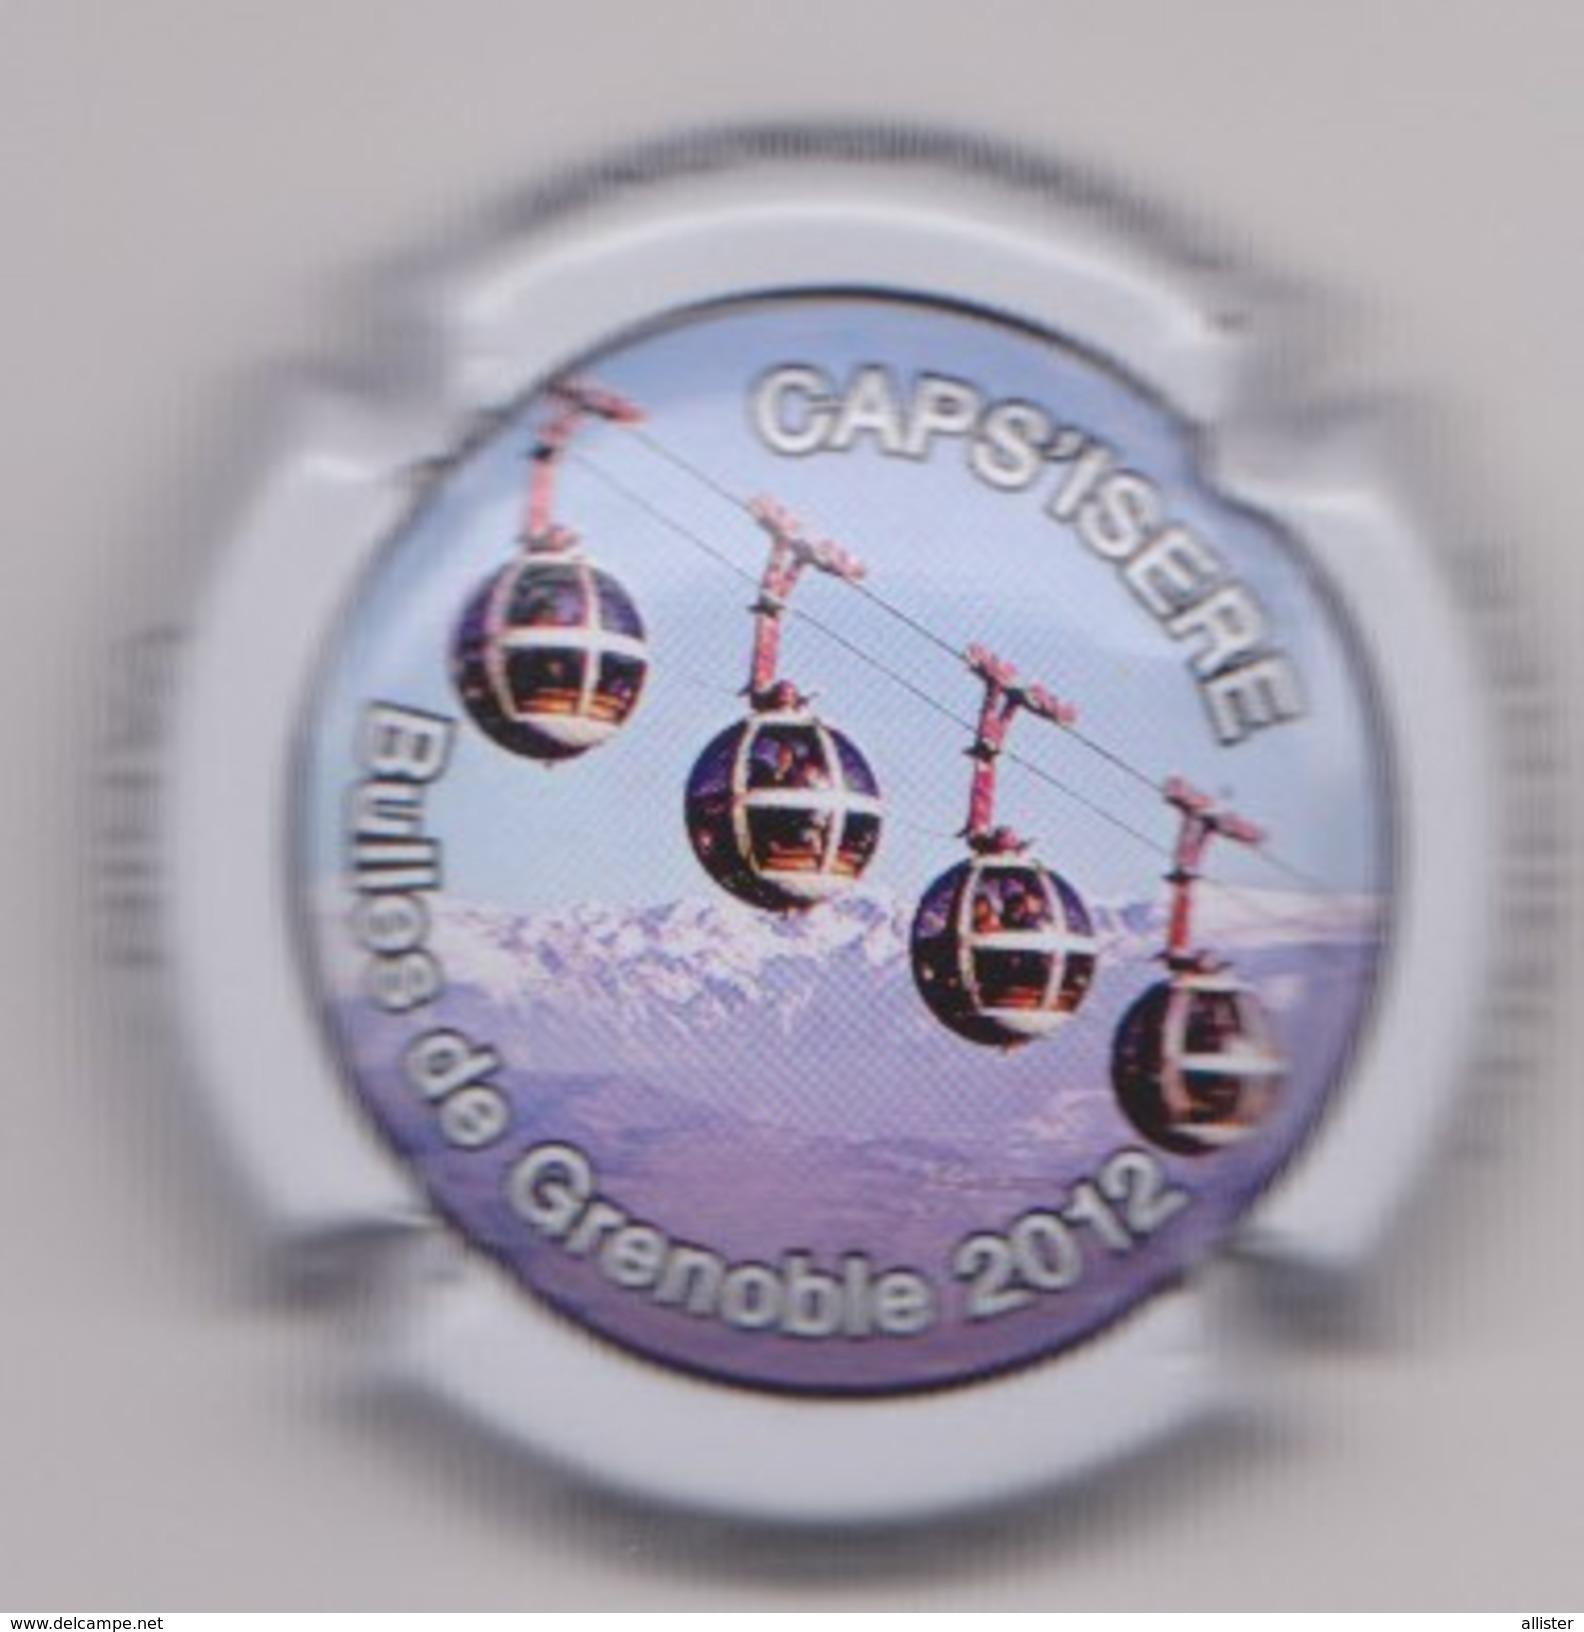 Capsule Champagne VADIN_PLATEAU ( 25 ; CAPS'ISERE , Bulles De Grenoble 2012) {S16-17} - Champagne